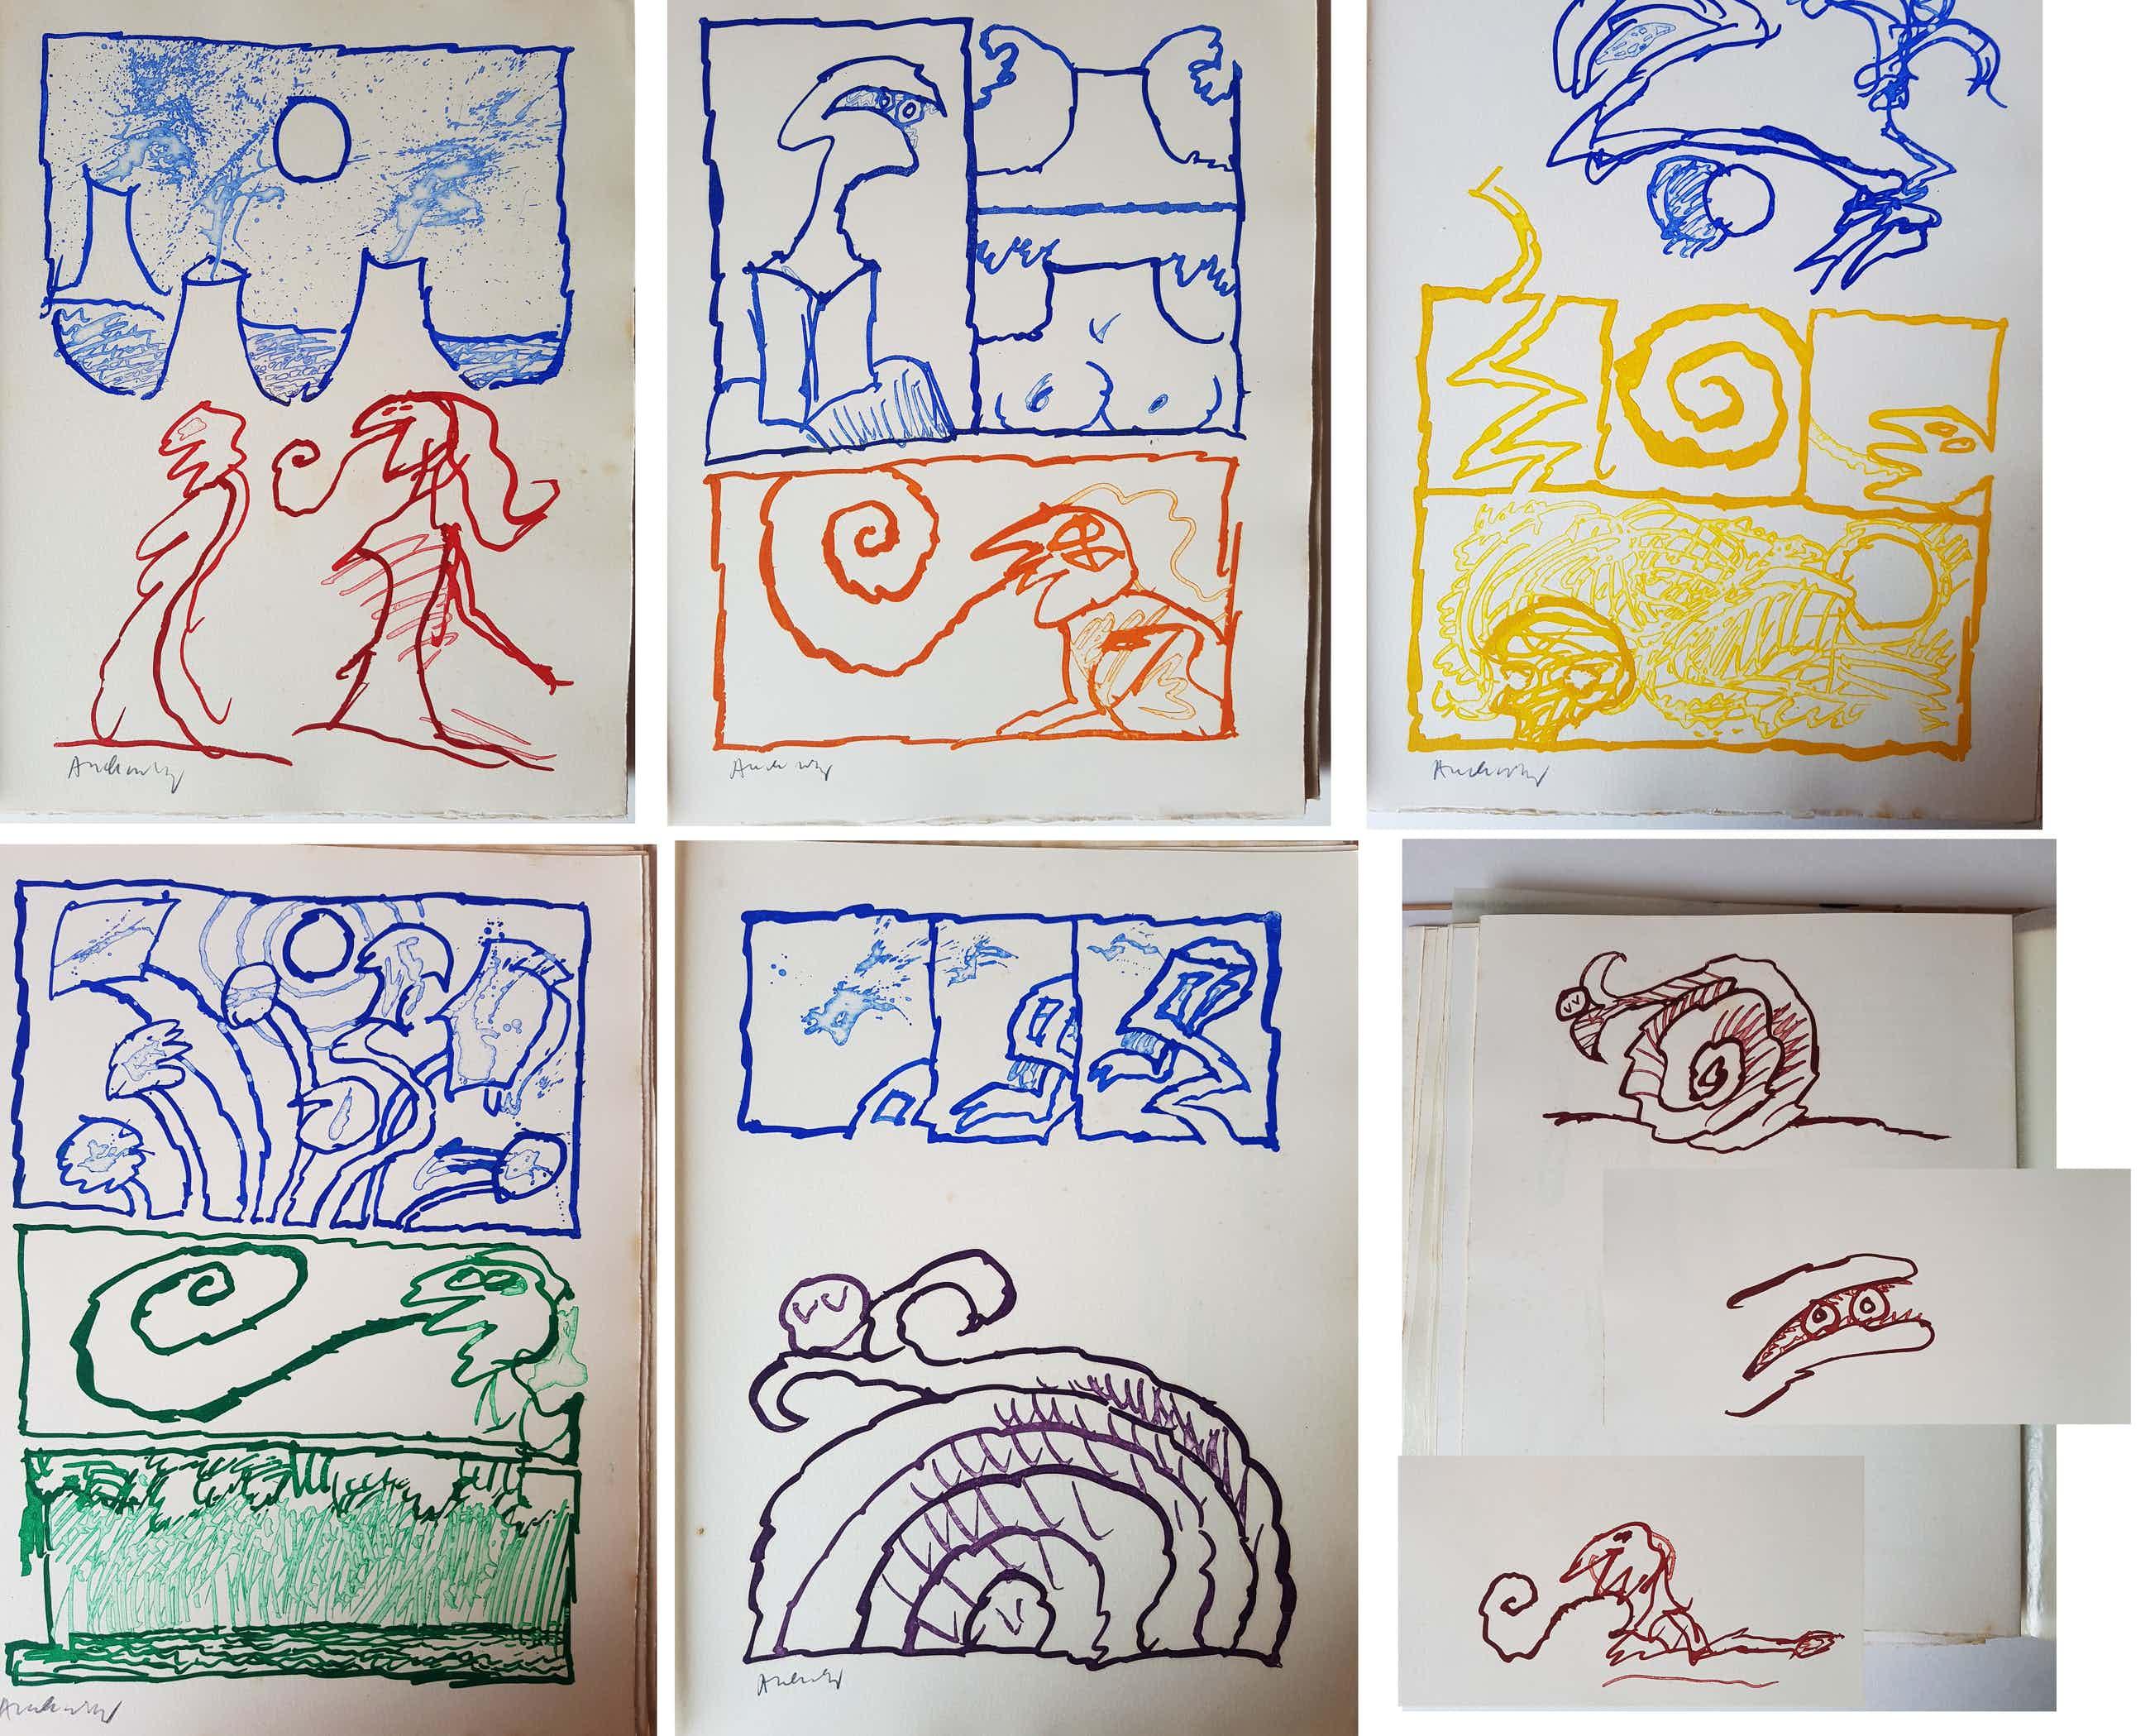 Pierre Alechinsky - Le rêve de l'ammonite kopen? Bied vanaf 2500!